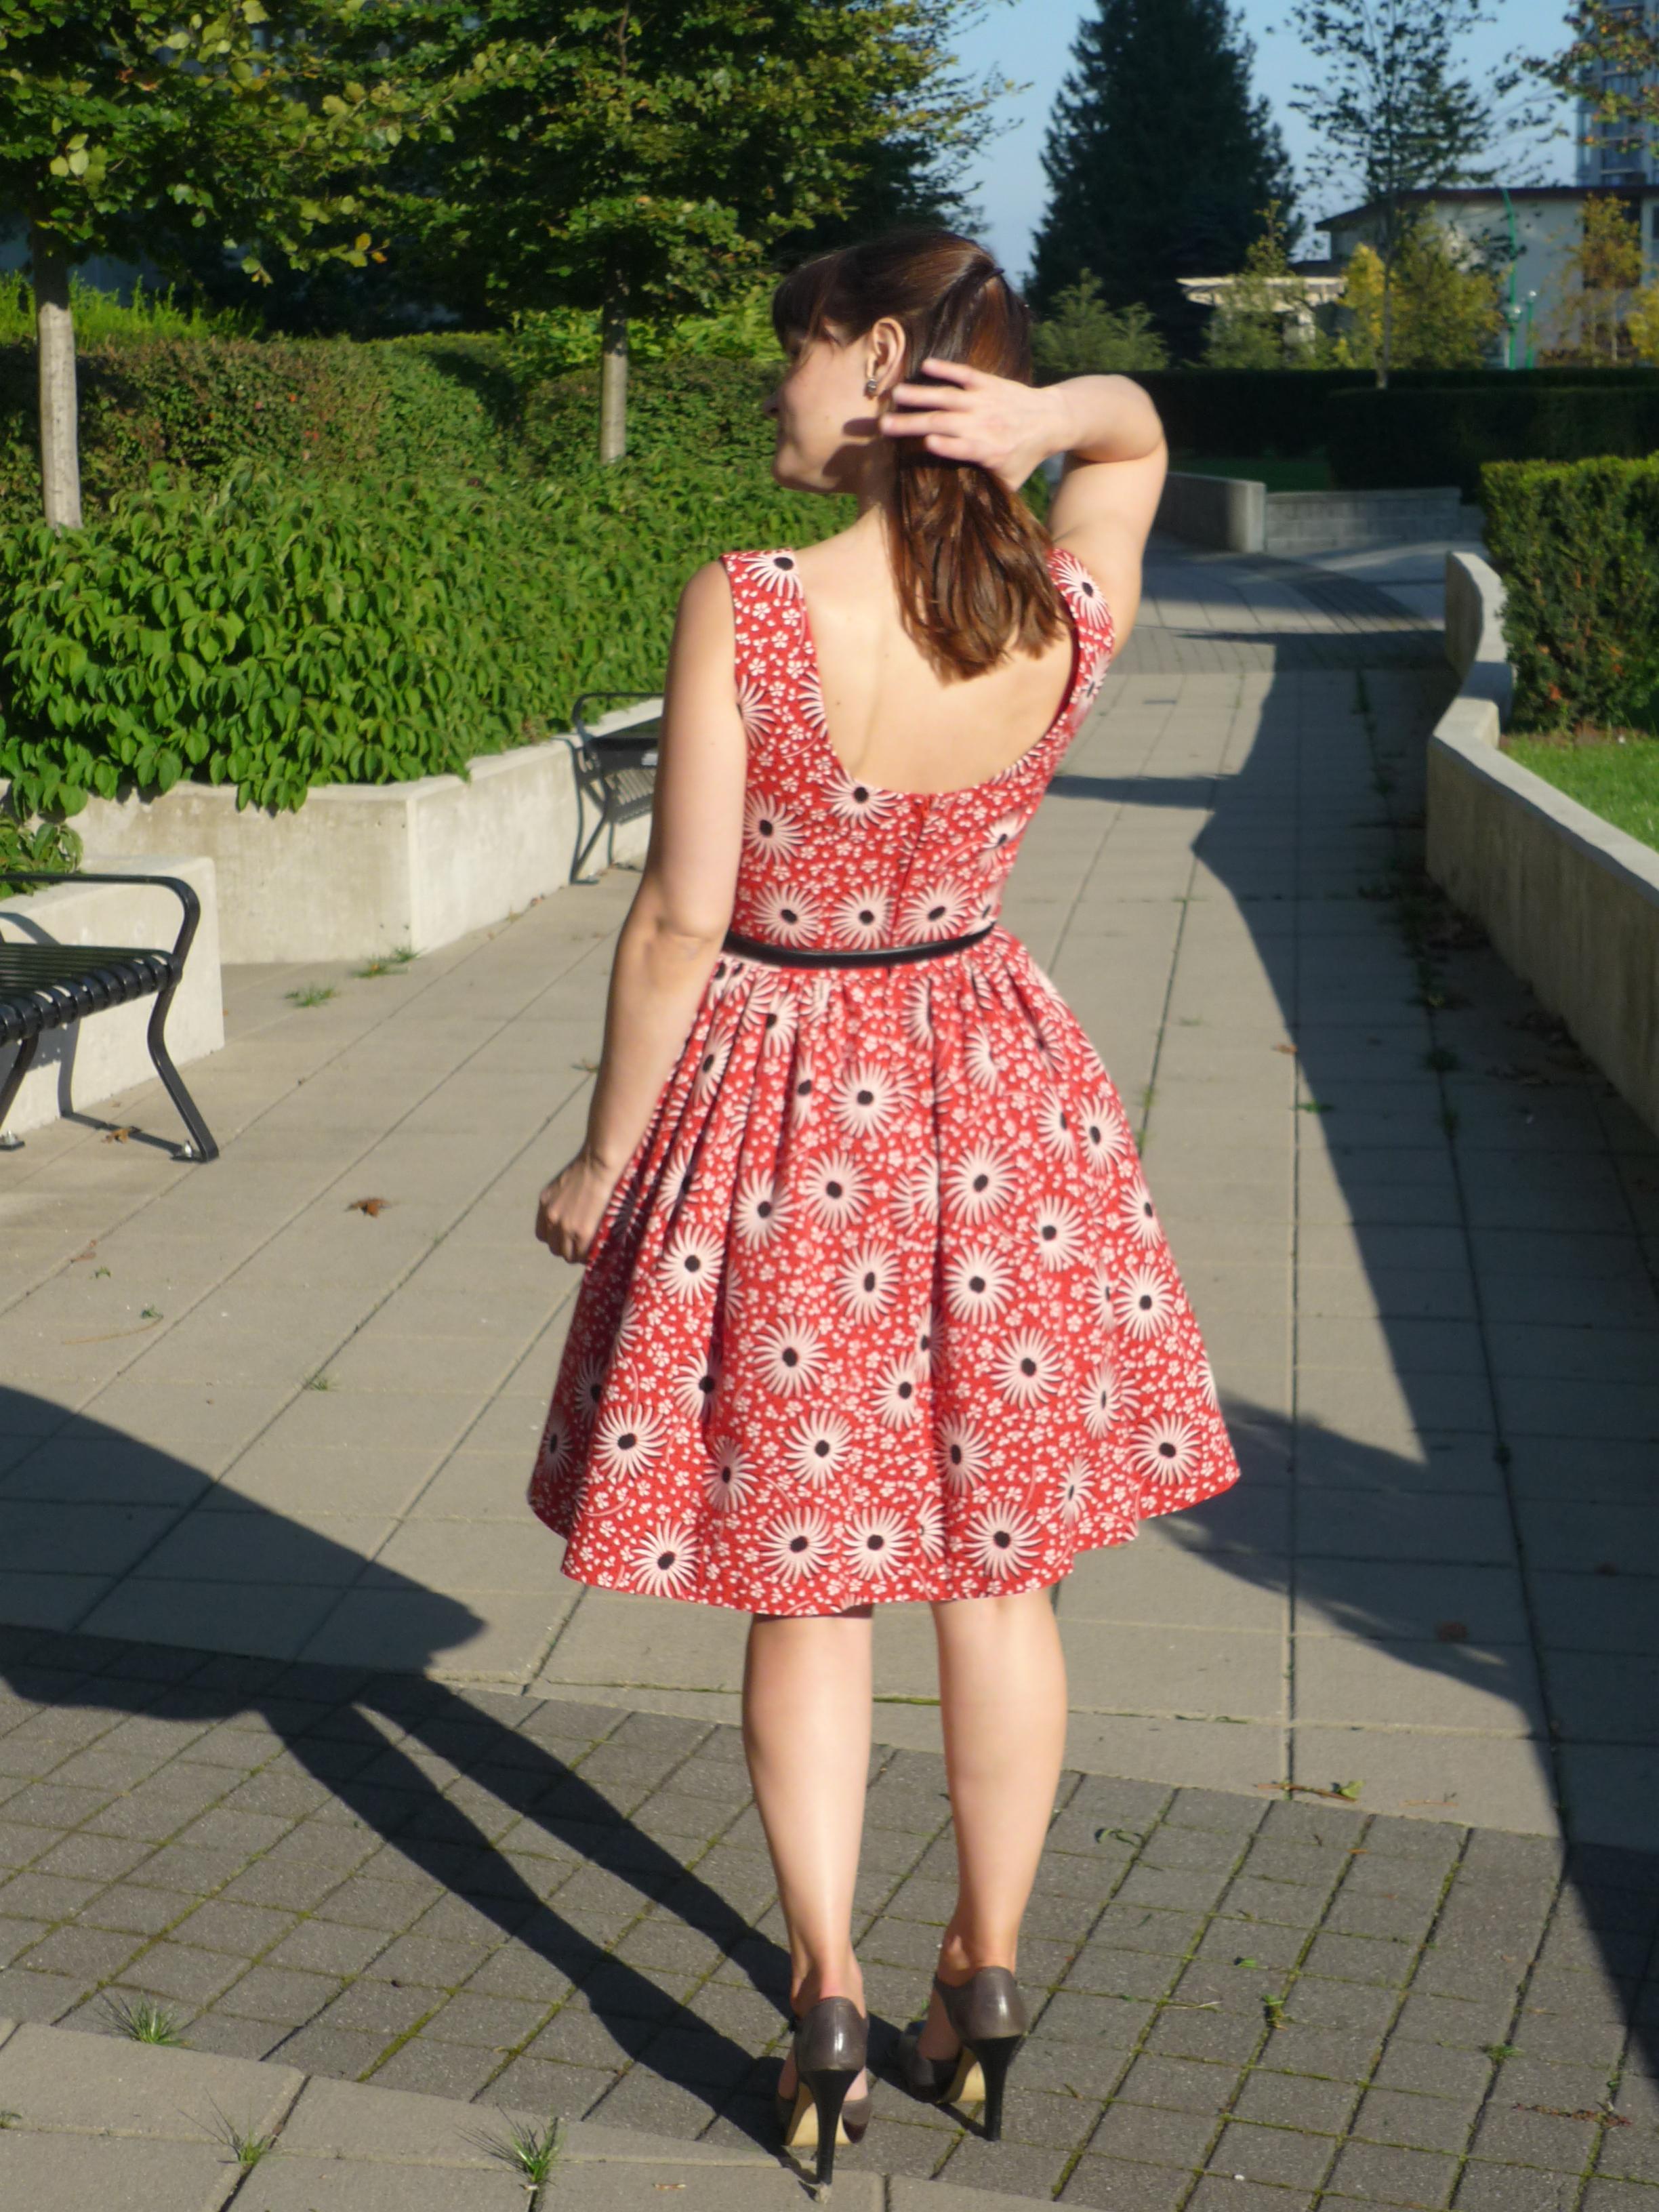 twin-spruce-dress-simplicity-3965-8.jpg